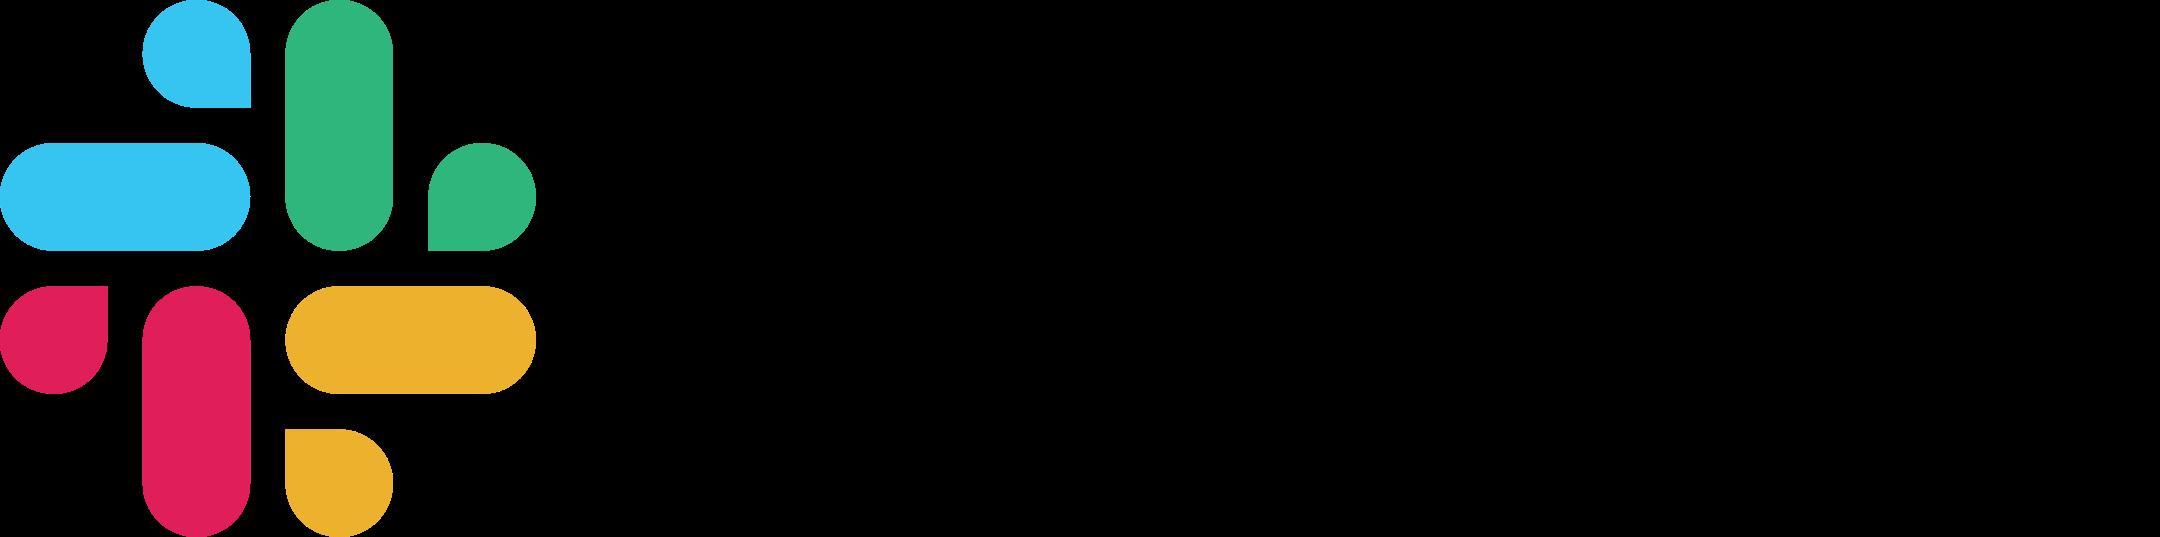 slack logo 2 - Slack Logo